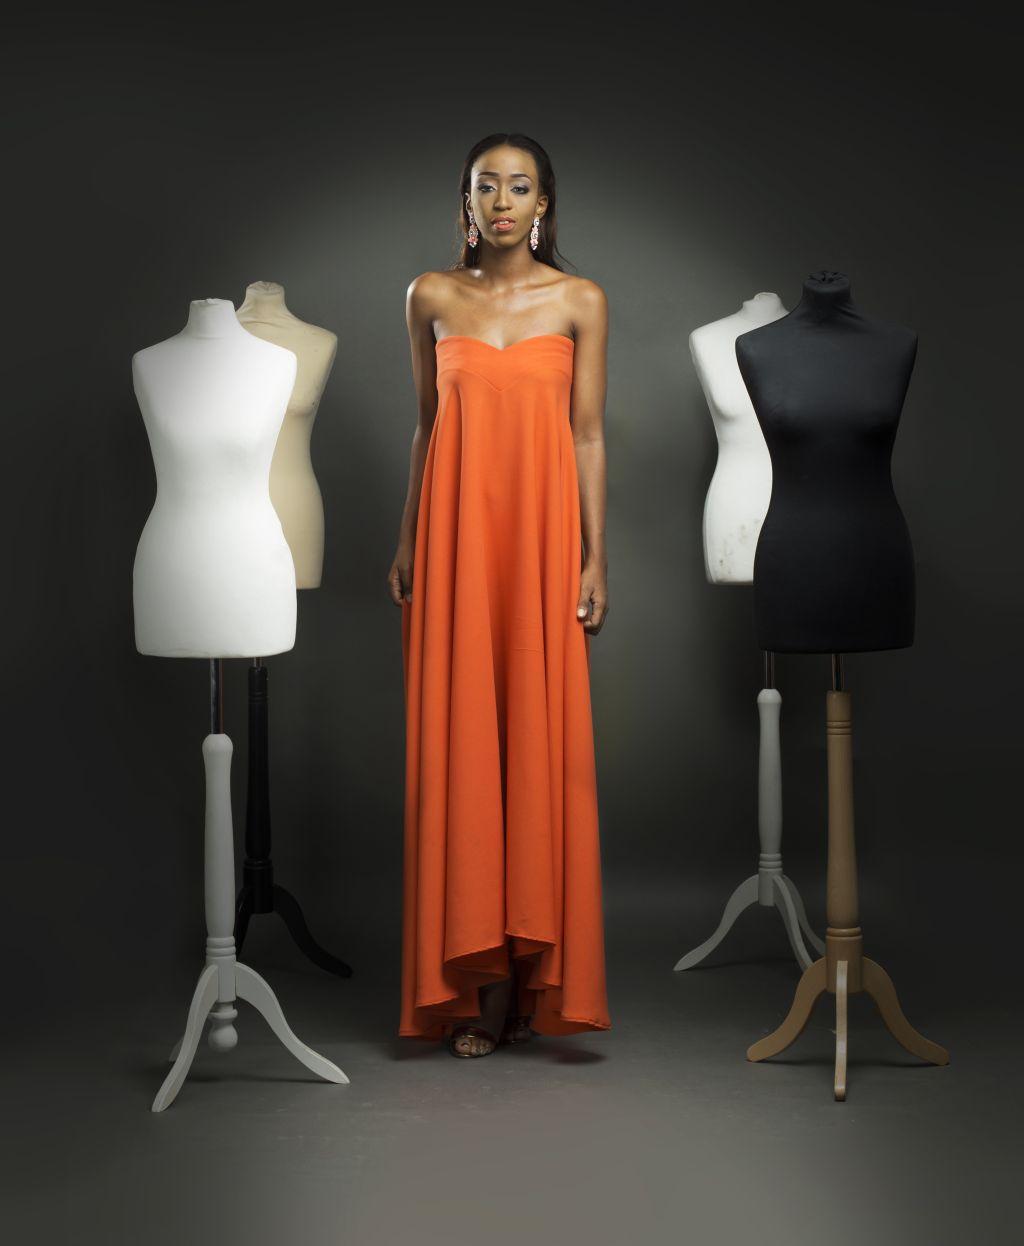 Nuraniya Ready To Wear 2015 Philosophy Collection - BellaNaija - March 2015001